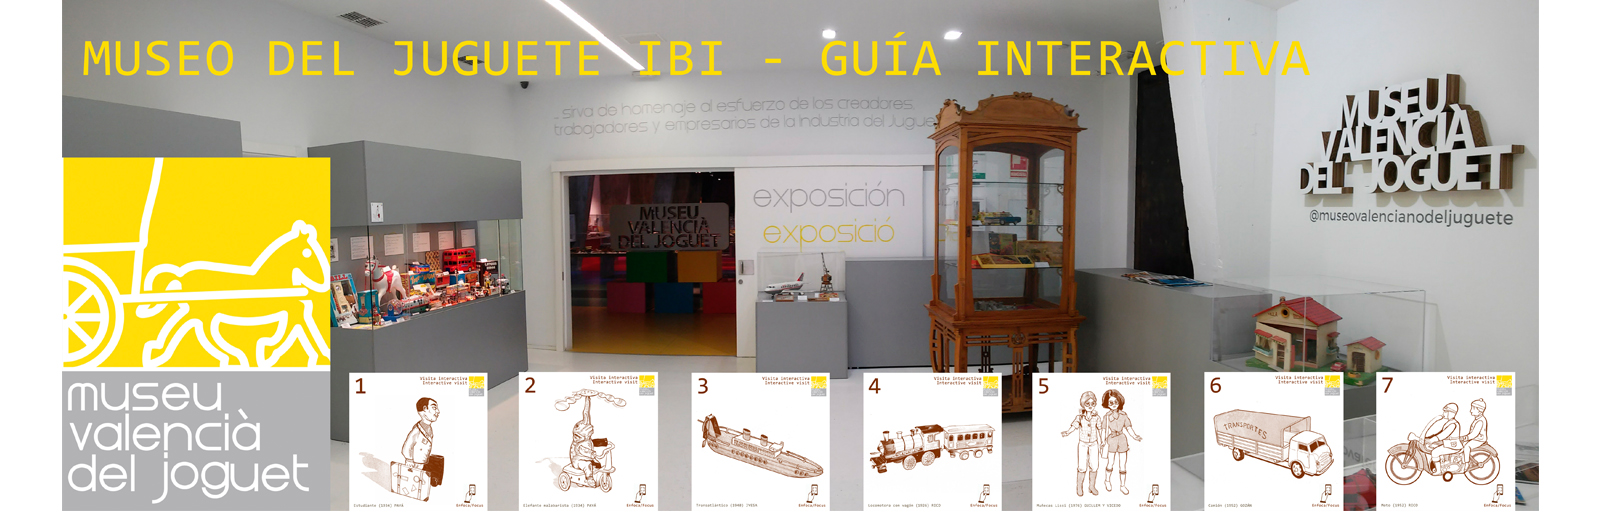 Guía-interactiva-cast